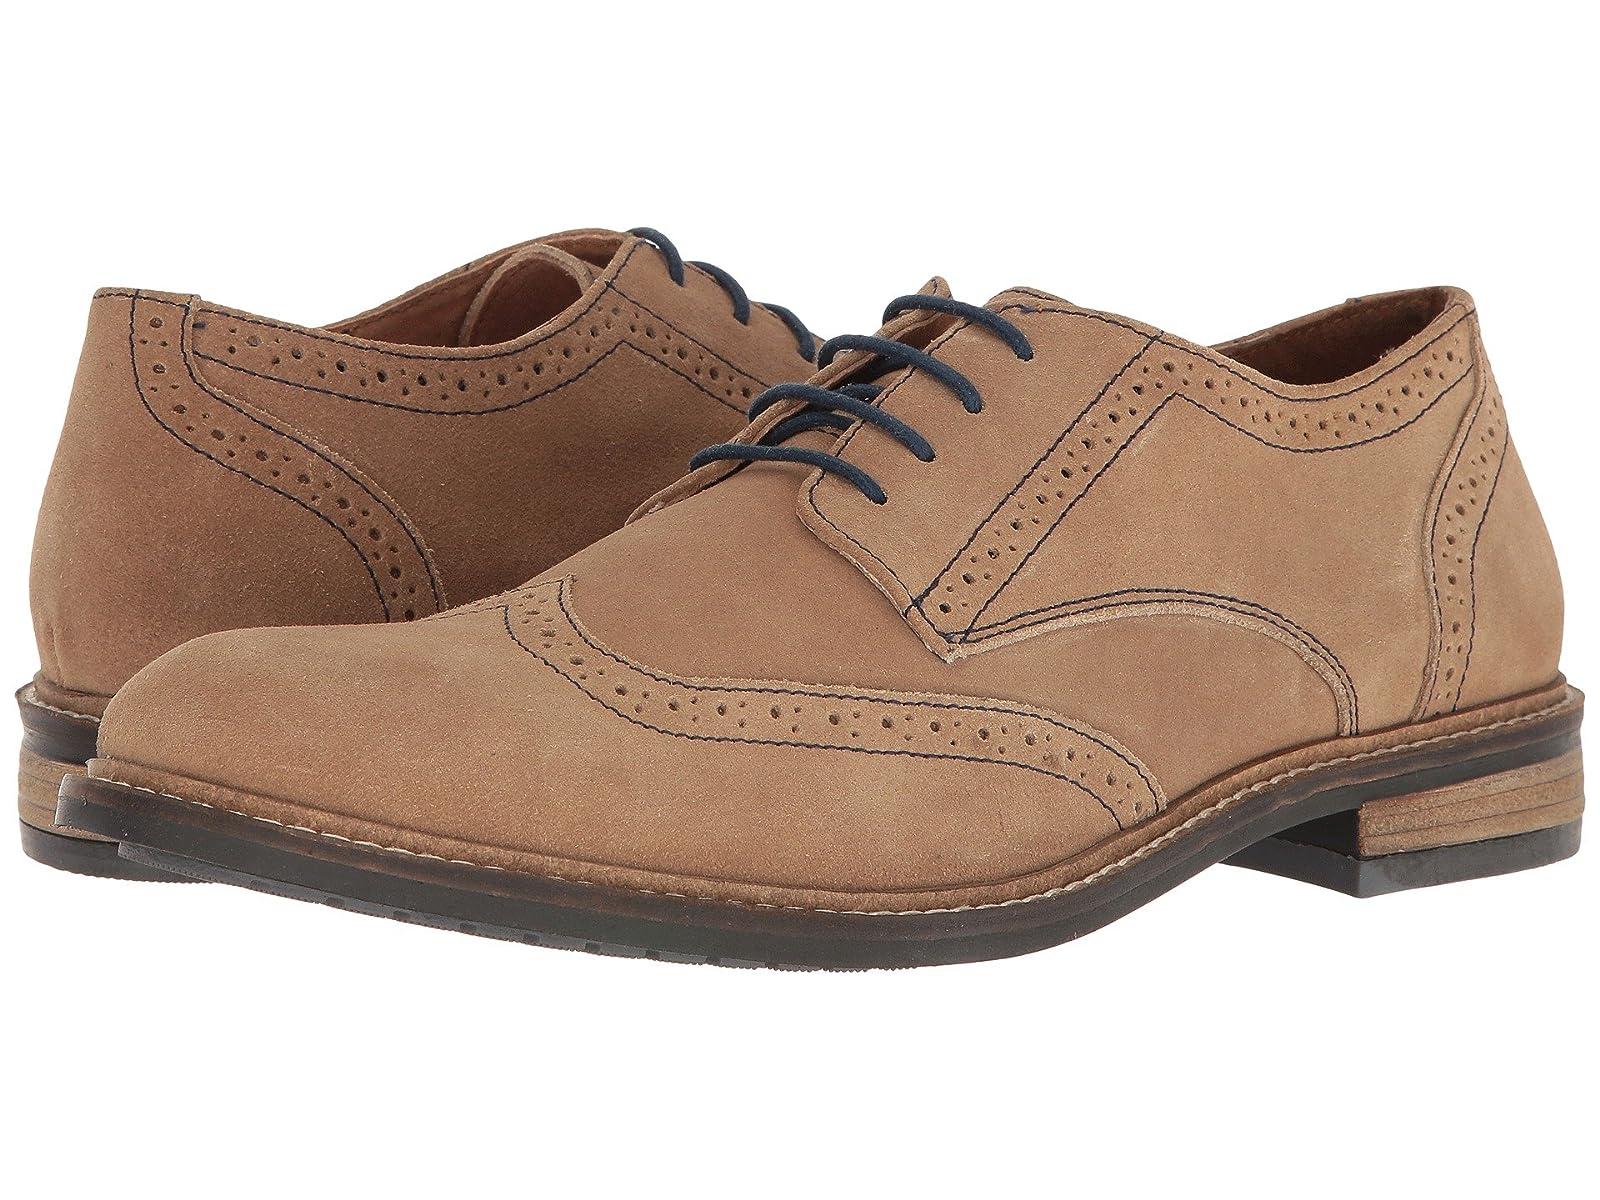 Lotus GarrettCheap and distinctive eye-catching shoes